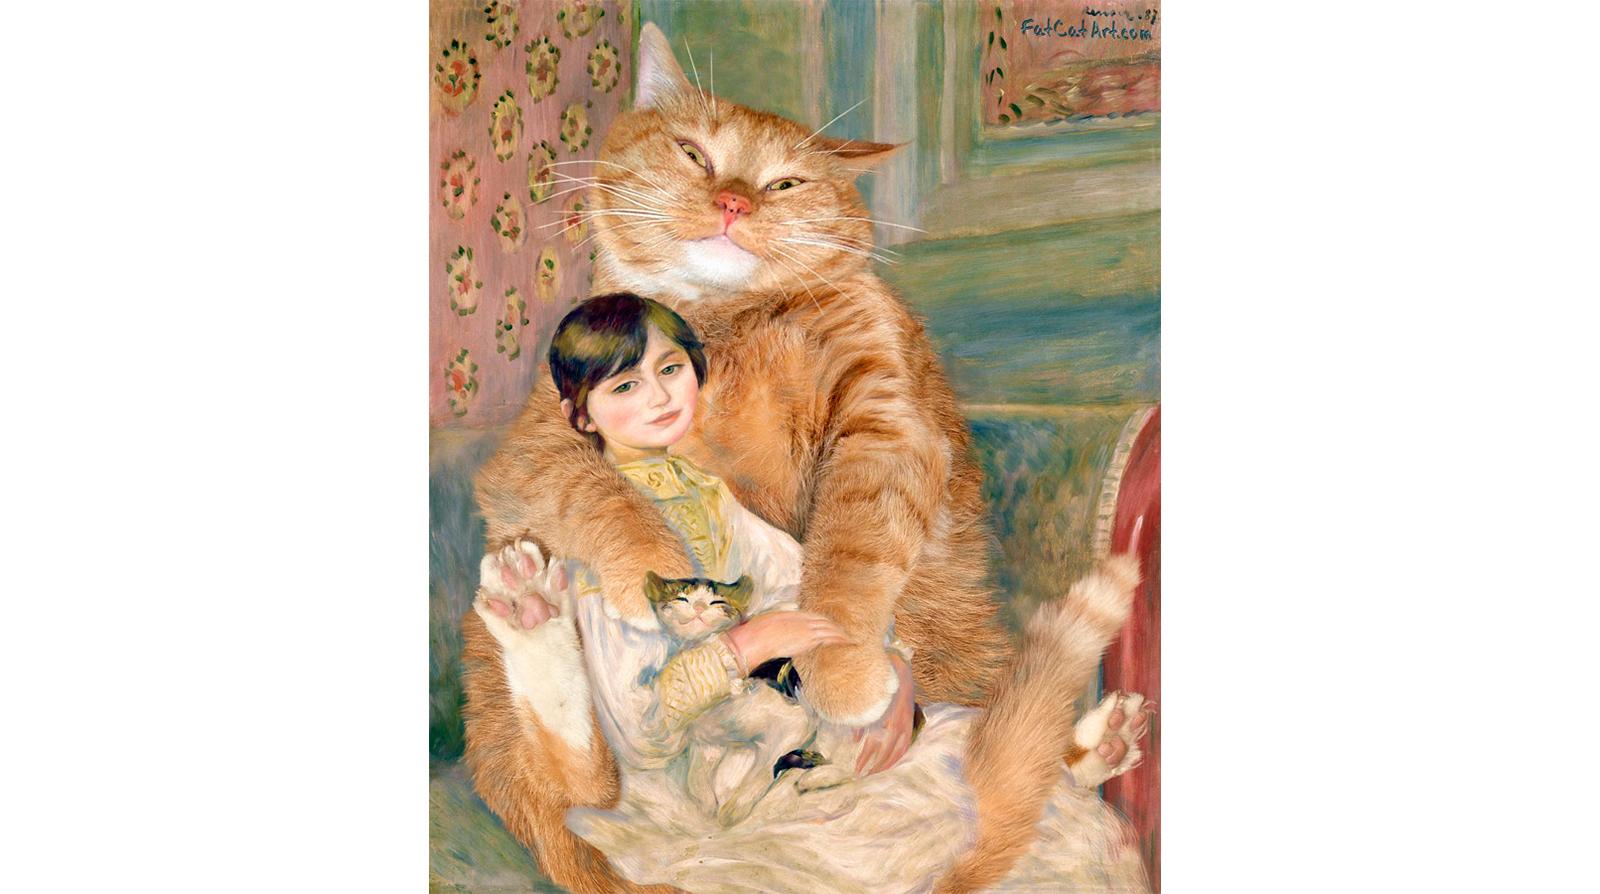 Pierre-Auguste Renoir. The Cat with Julie Manet